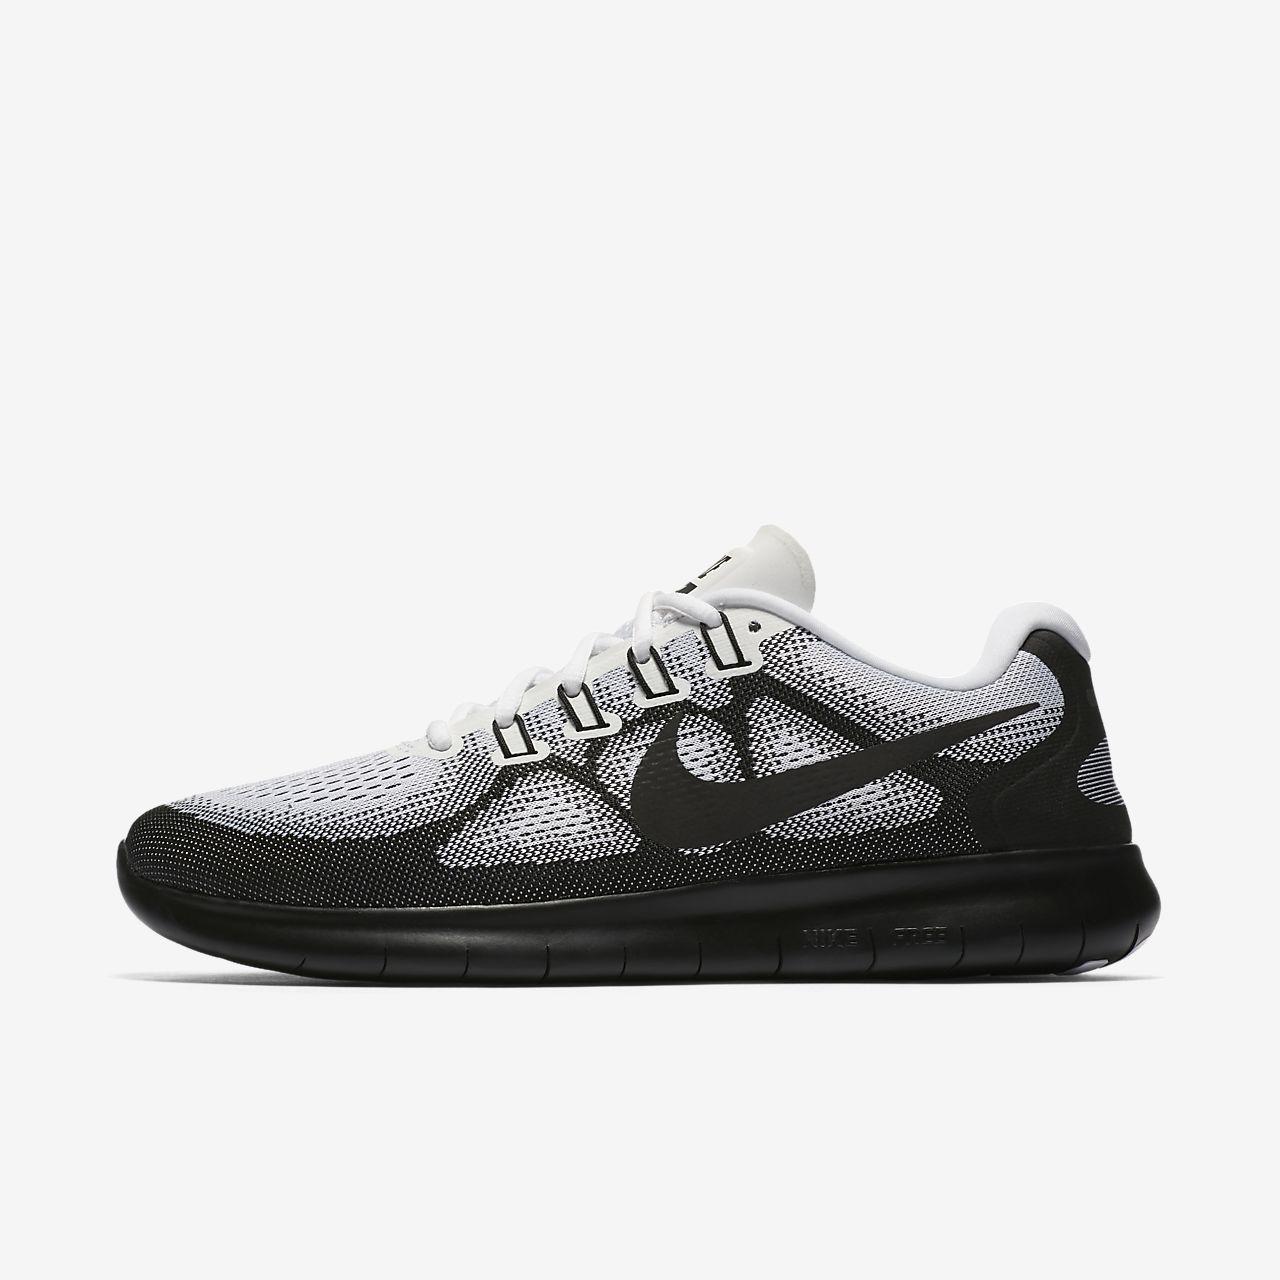 18d8b6852c911 Nike Free RN 2017 LE Men s Running Shoe